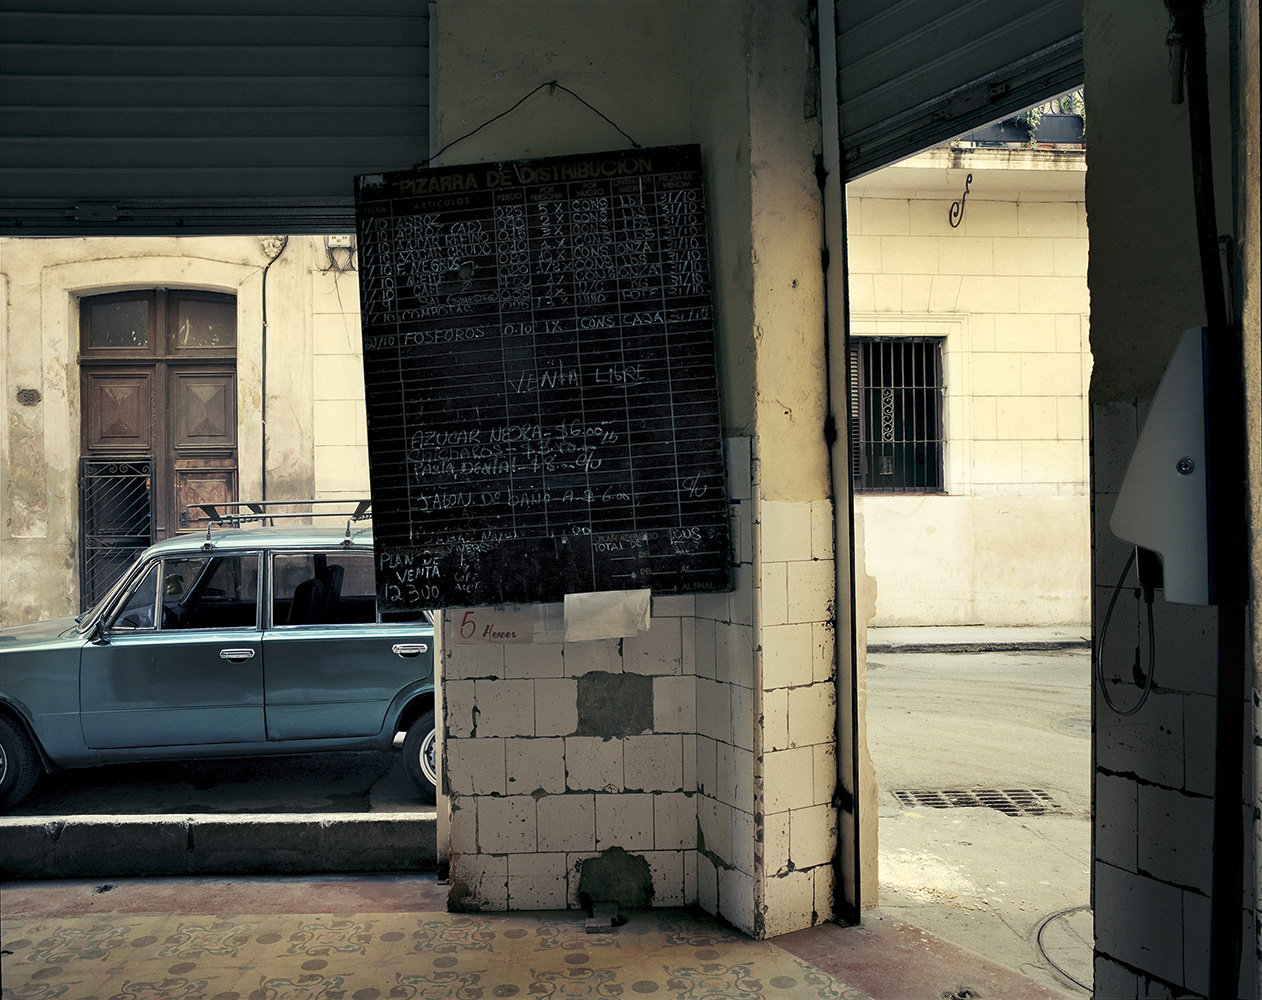 Government ration store in Old Havana, Havana City.